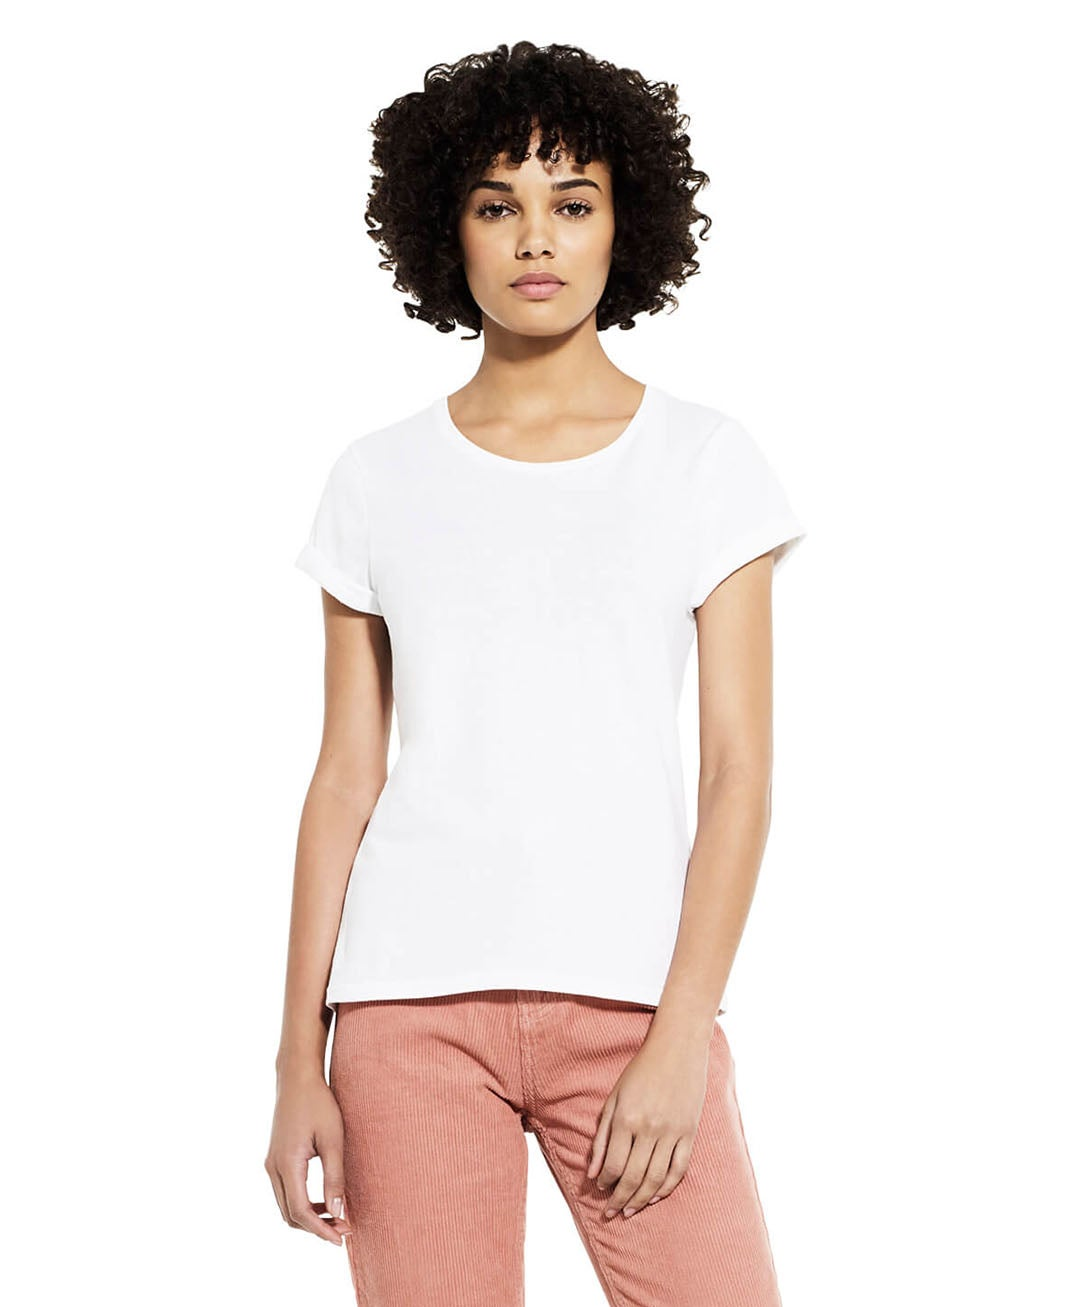 Image of OM ASATOMA SAD GAMAYA – wrapped – mustard yellow/rose – white t-shirt w/ rolled-up sleeves